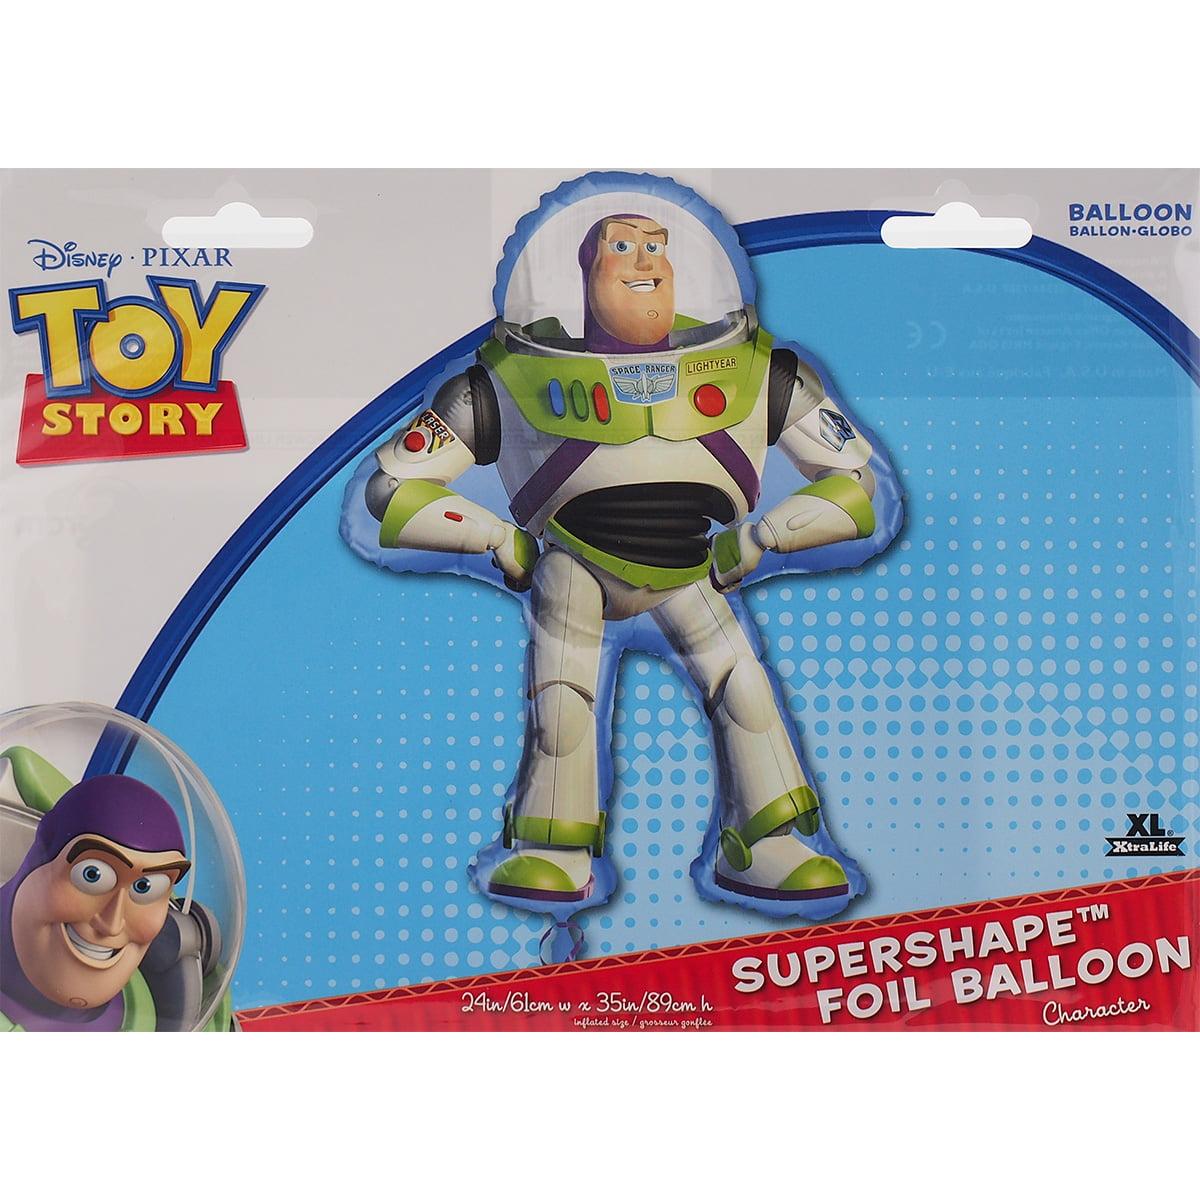 Toy story 4 Buzz Lightyear Airwalker Parti Géant Foil Balloon